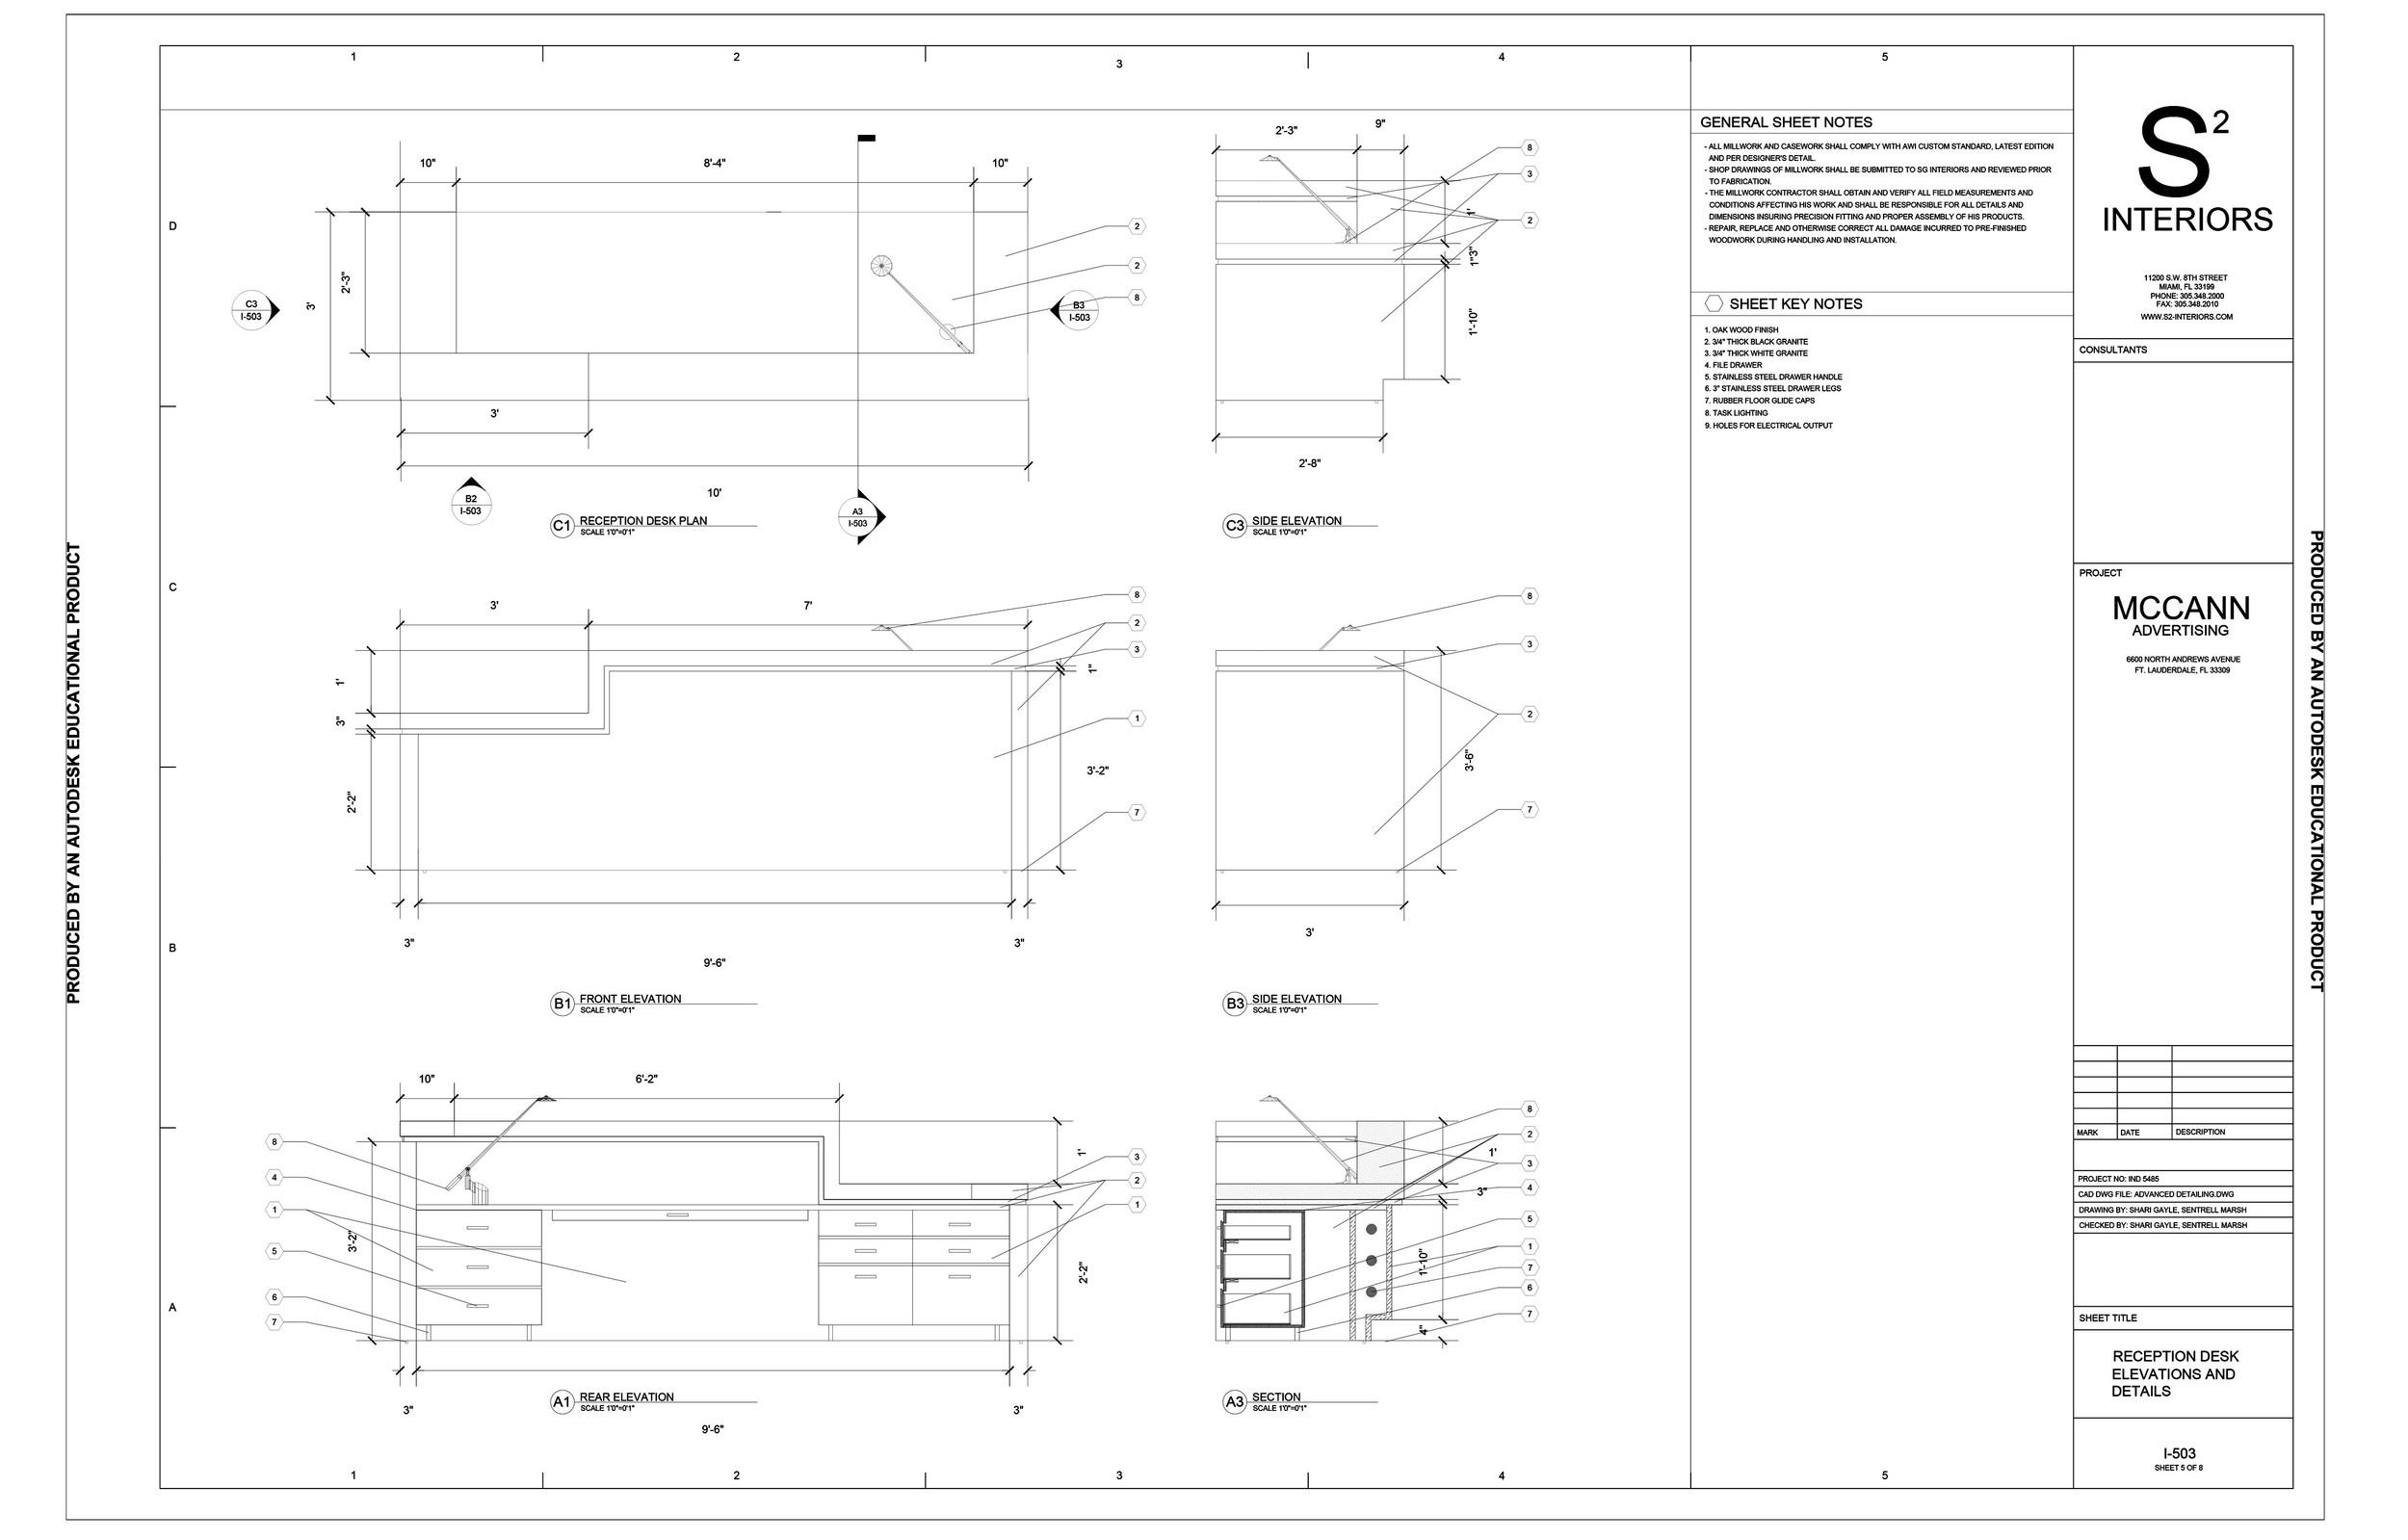 McCann - Reception Desk dark.jpg